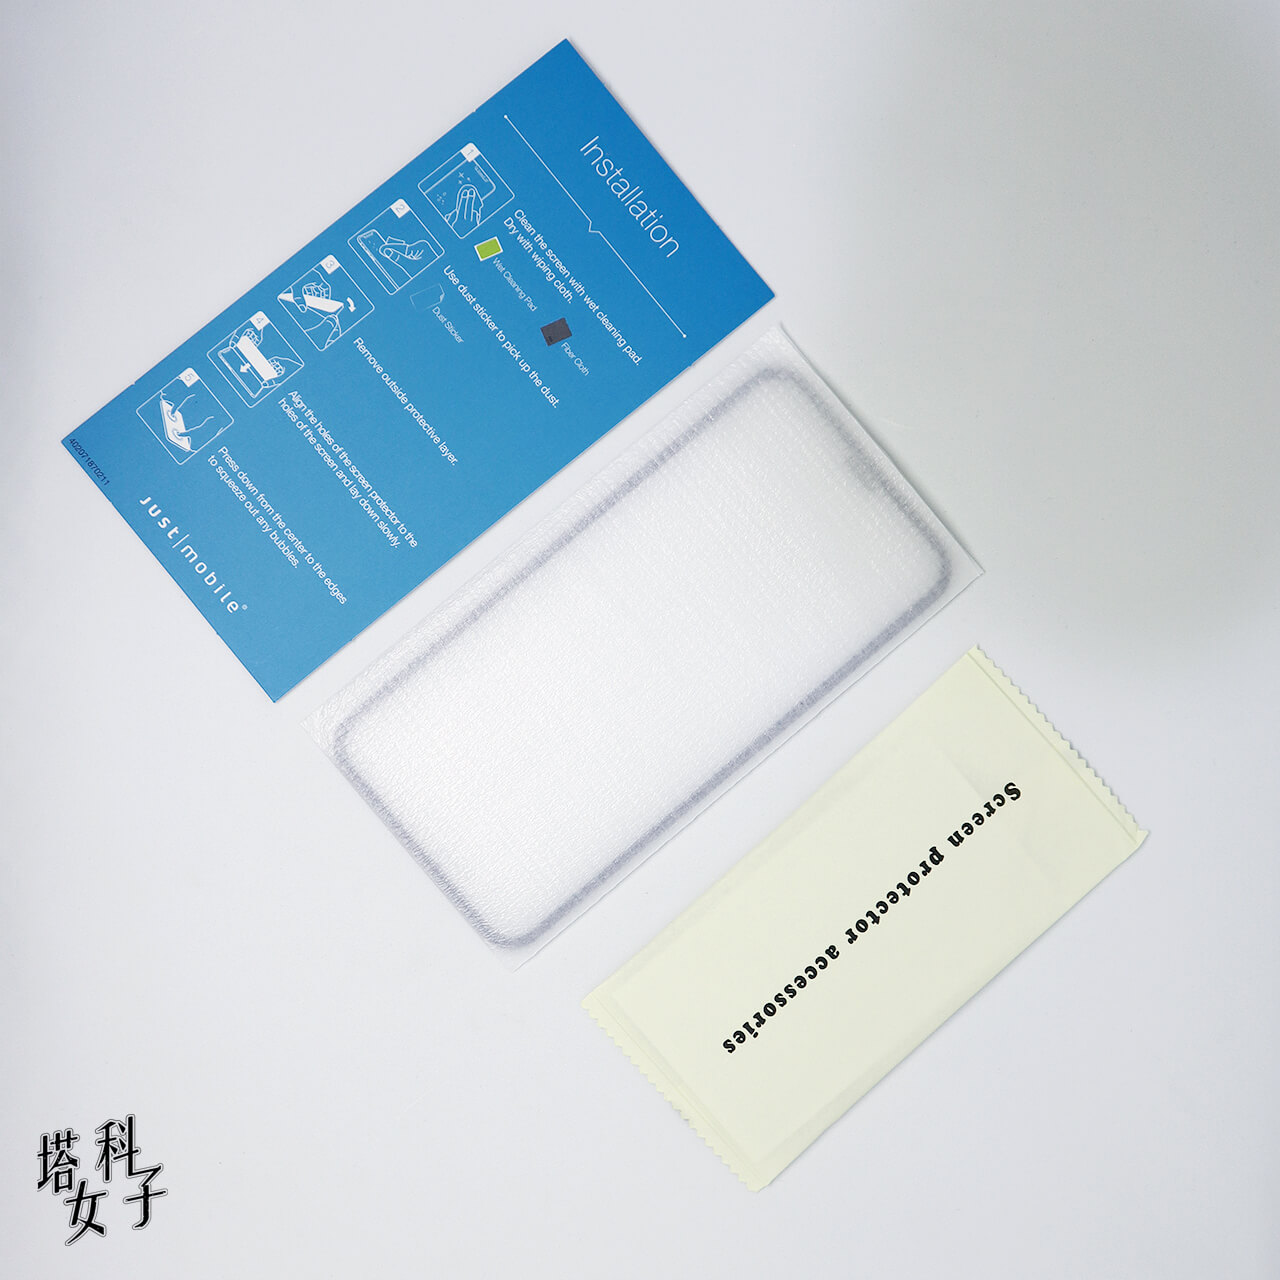 Just mobile Xkin™ 3D 滿版強化玻璃貼 內容物